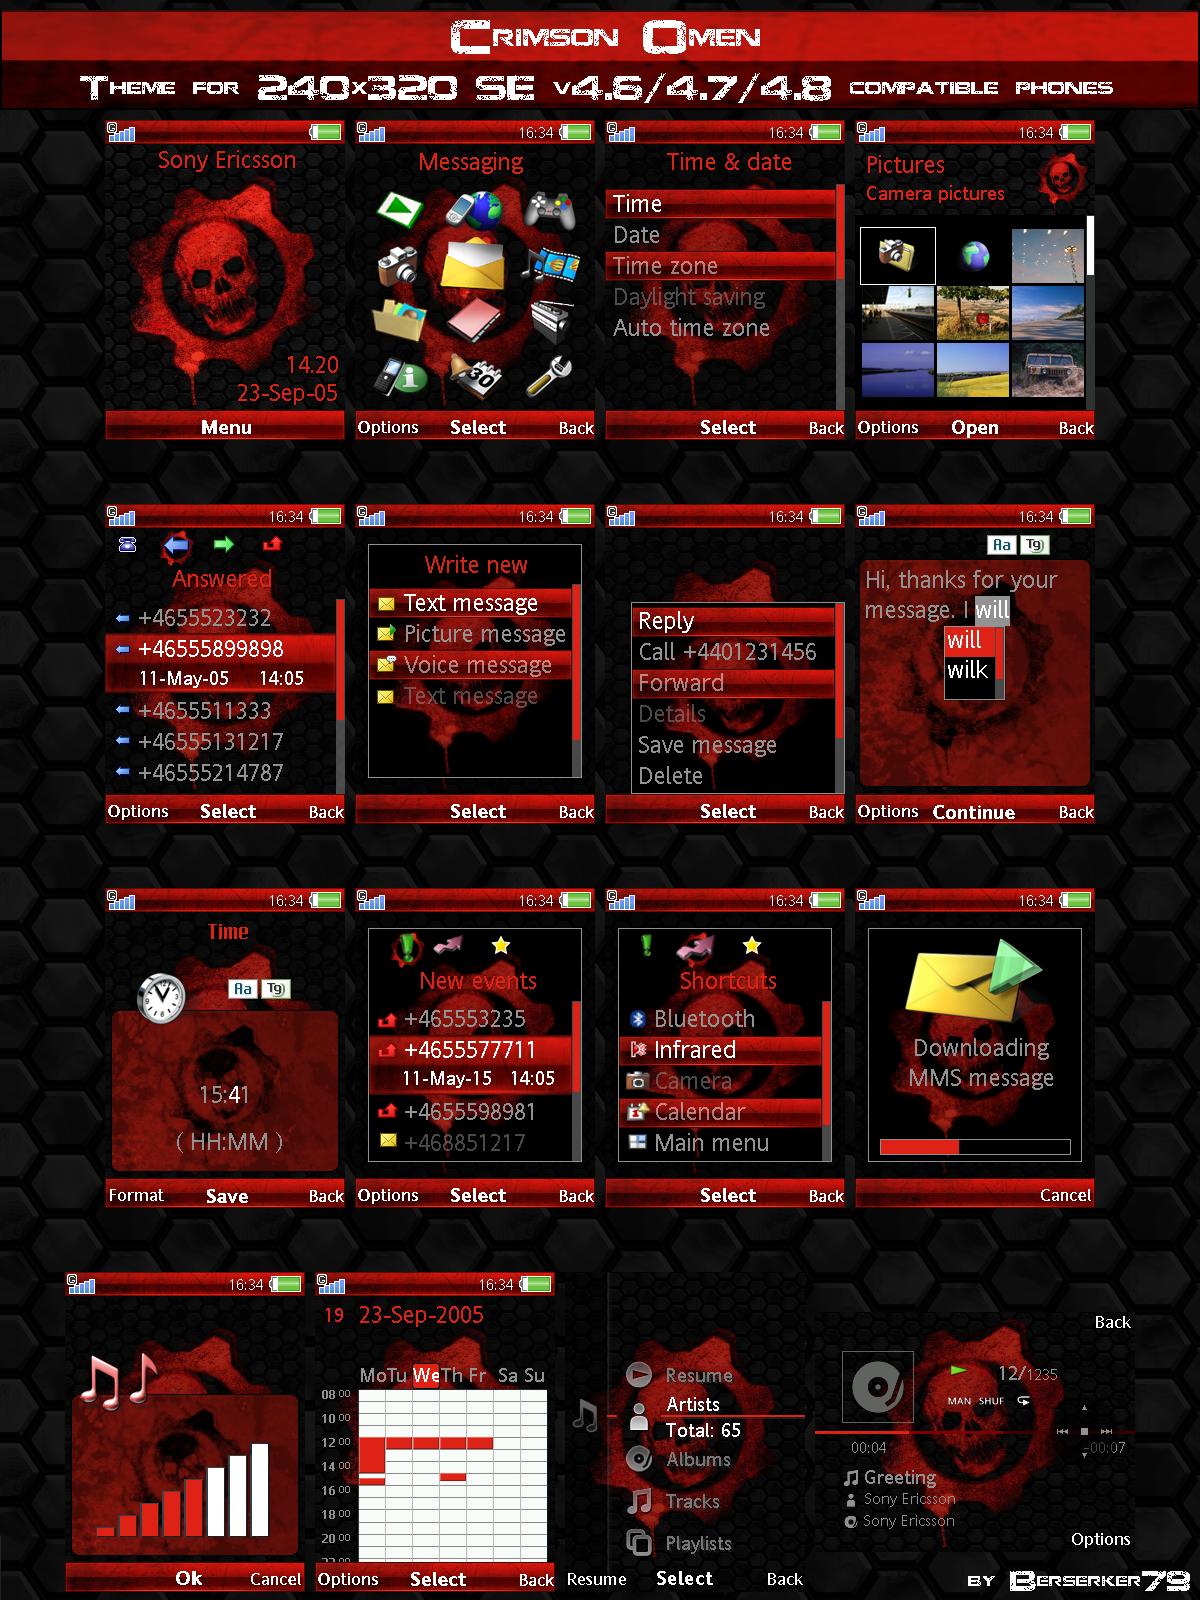 GOW Crimson Omen SE Theme by Berserker79 1200x1600